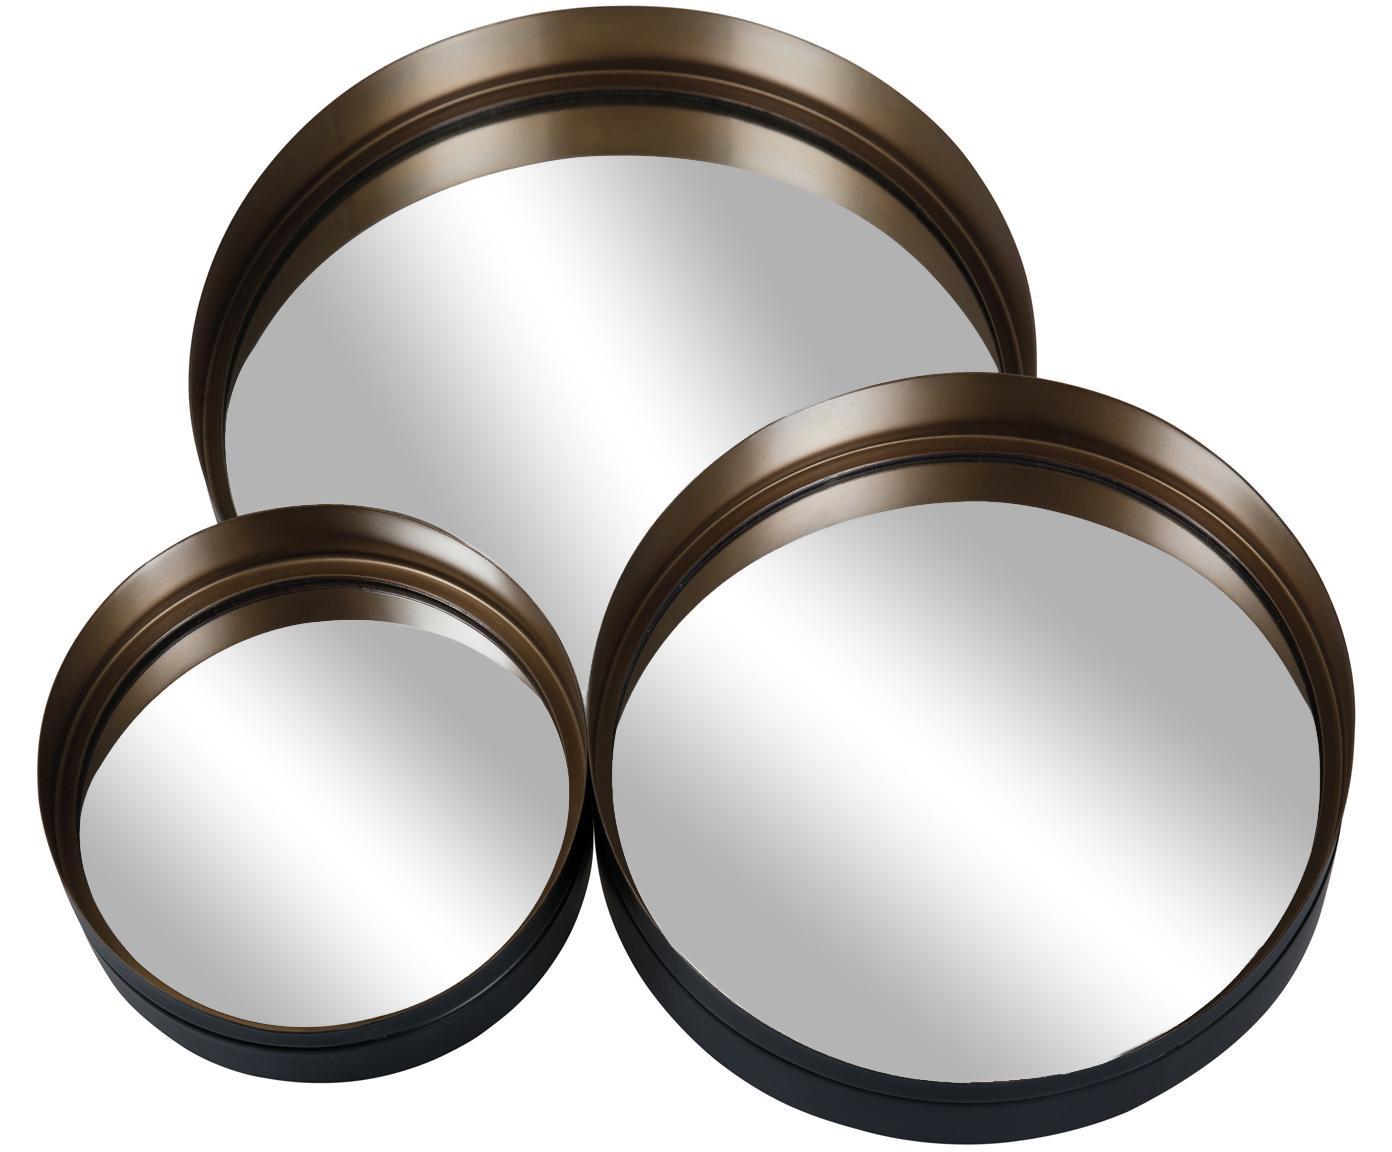 Set de espejos de pared redondos Dolce, 3pzas., Espejo: cristal, Reverso: tablero de fibras de dens, Negro, oro, Tamaños diferentes